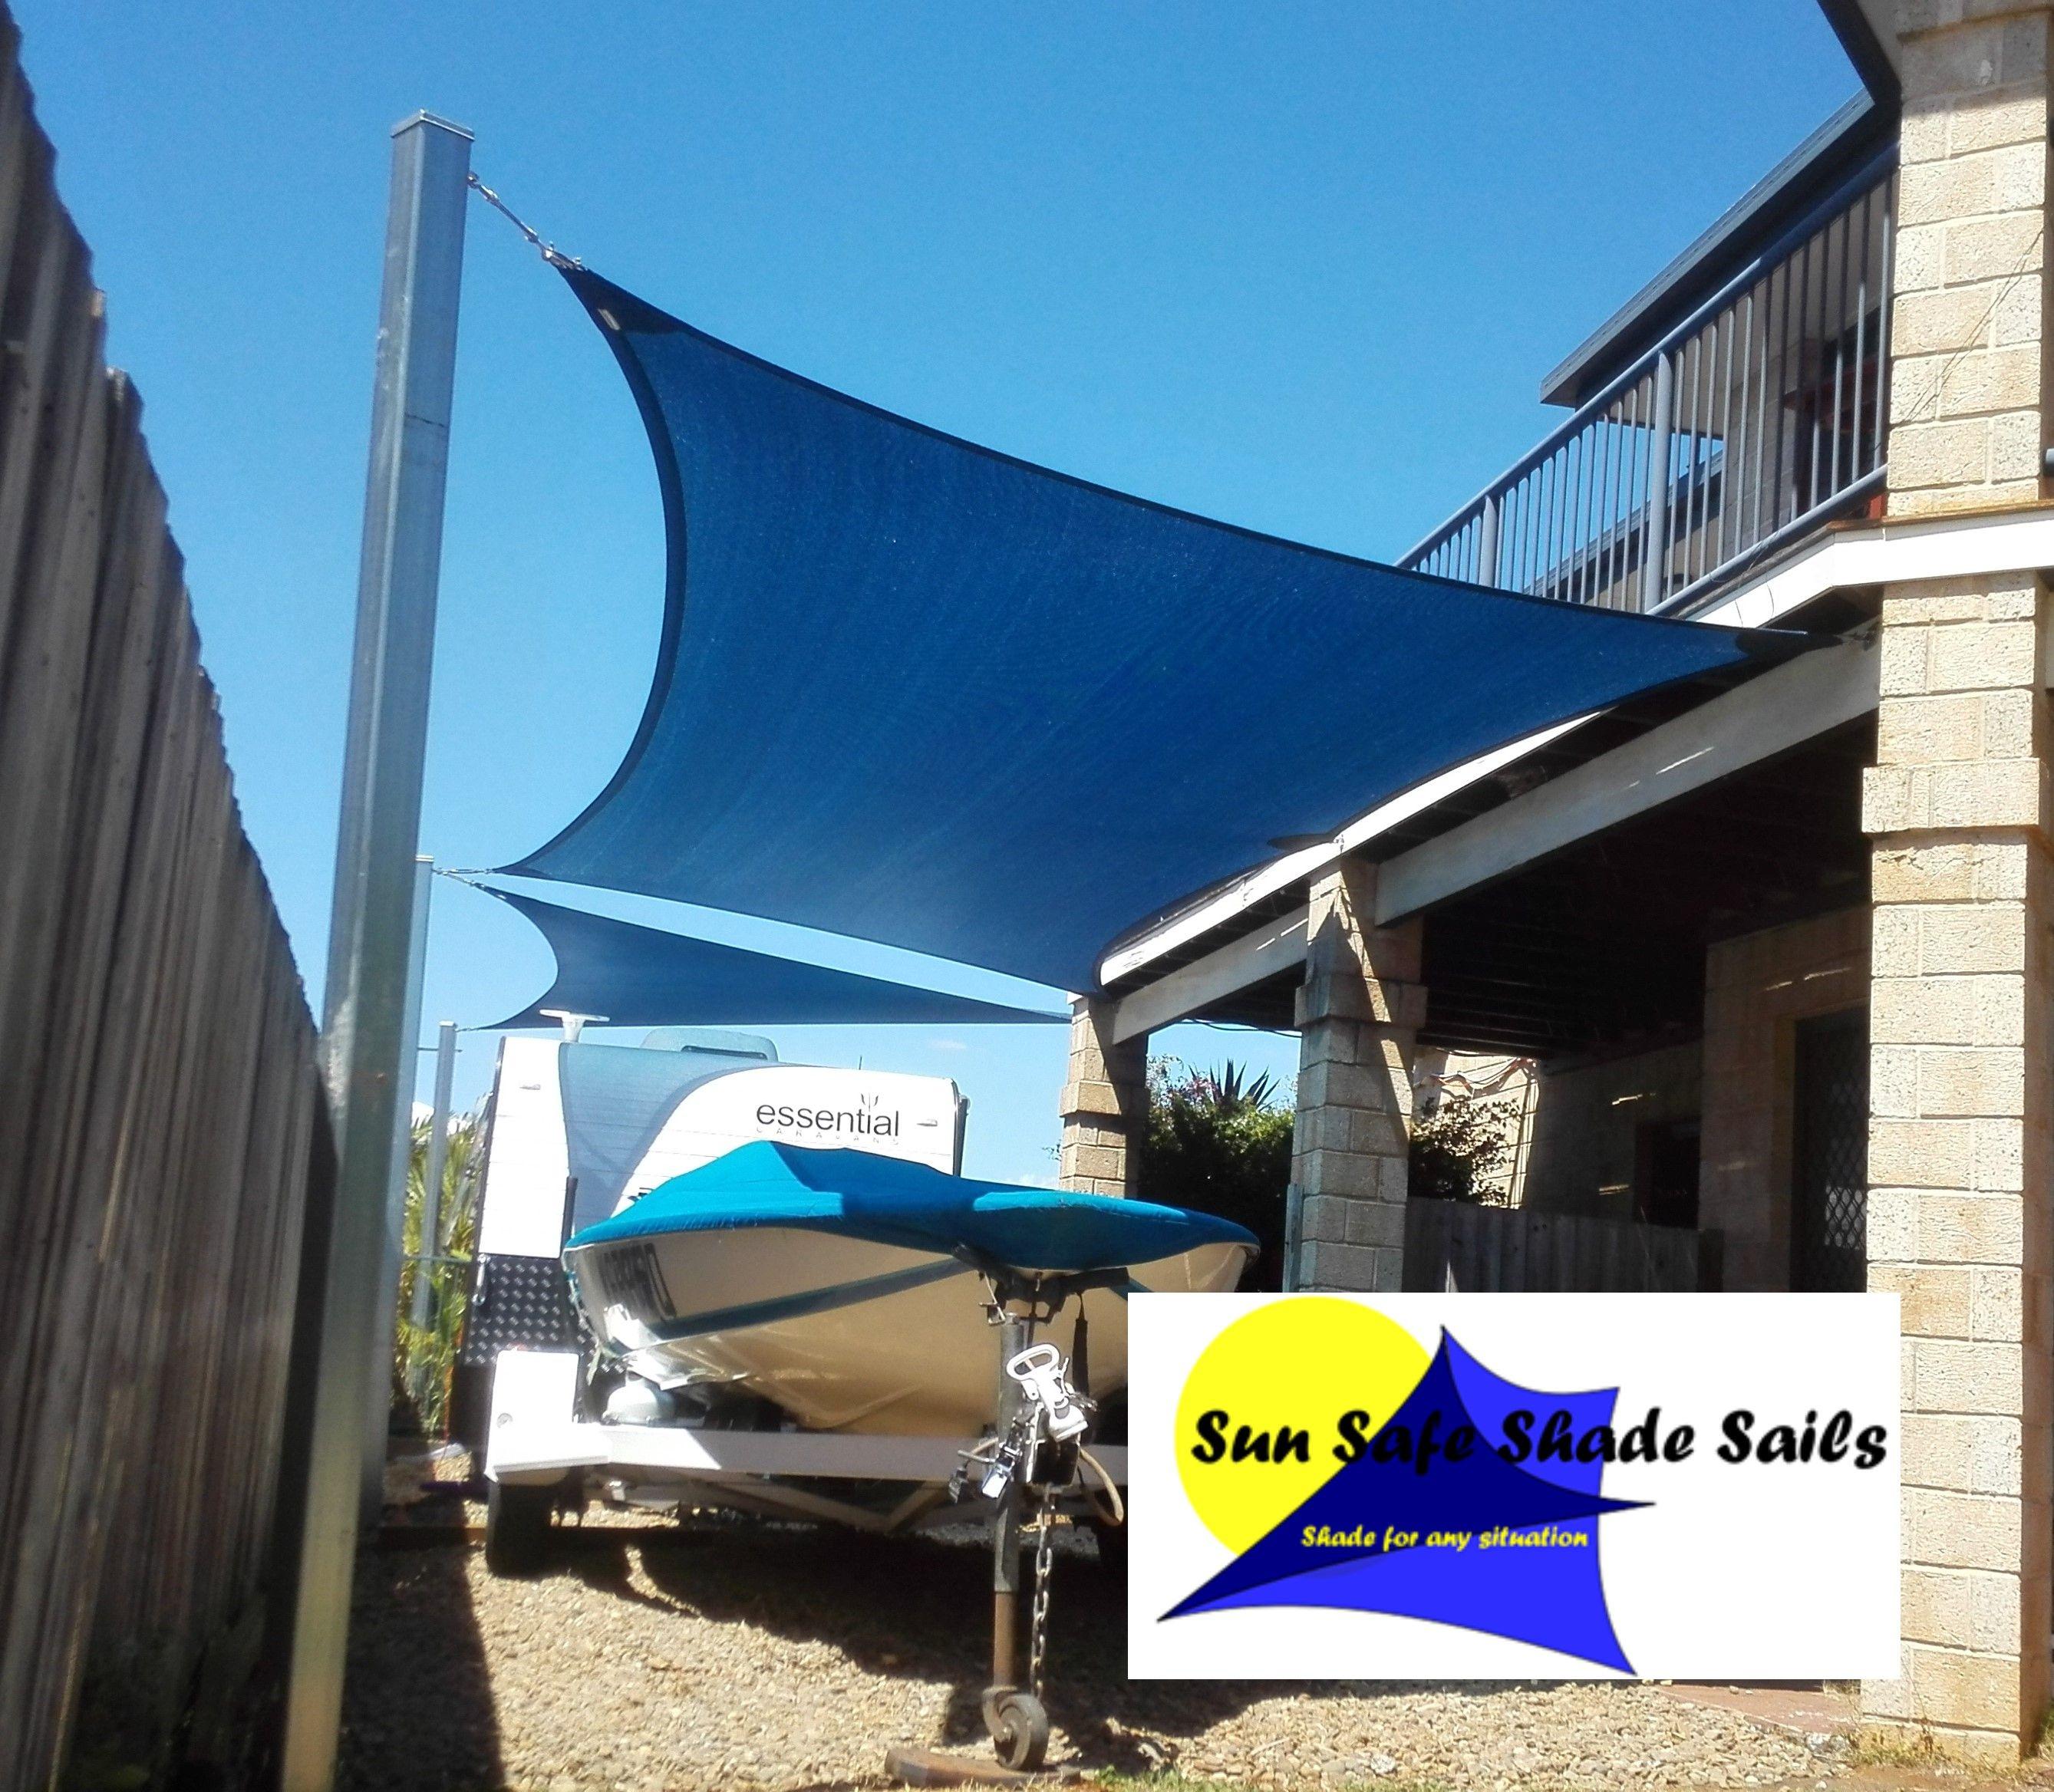 Sun Safe Shade Sails Caravan Shade Sail Protect Your Boat And Caravan With Custom Made Shade Sail Contact Sun Safe Shade Sails Shade Sail Redlands Ipswich